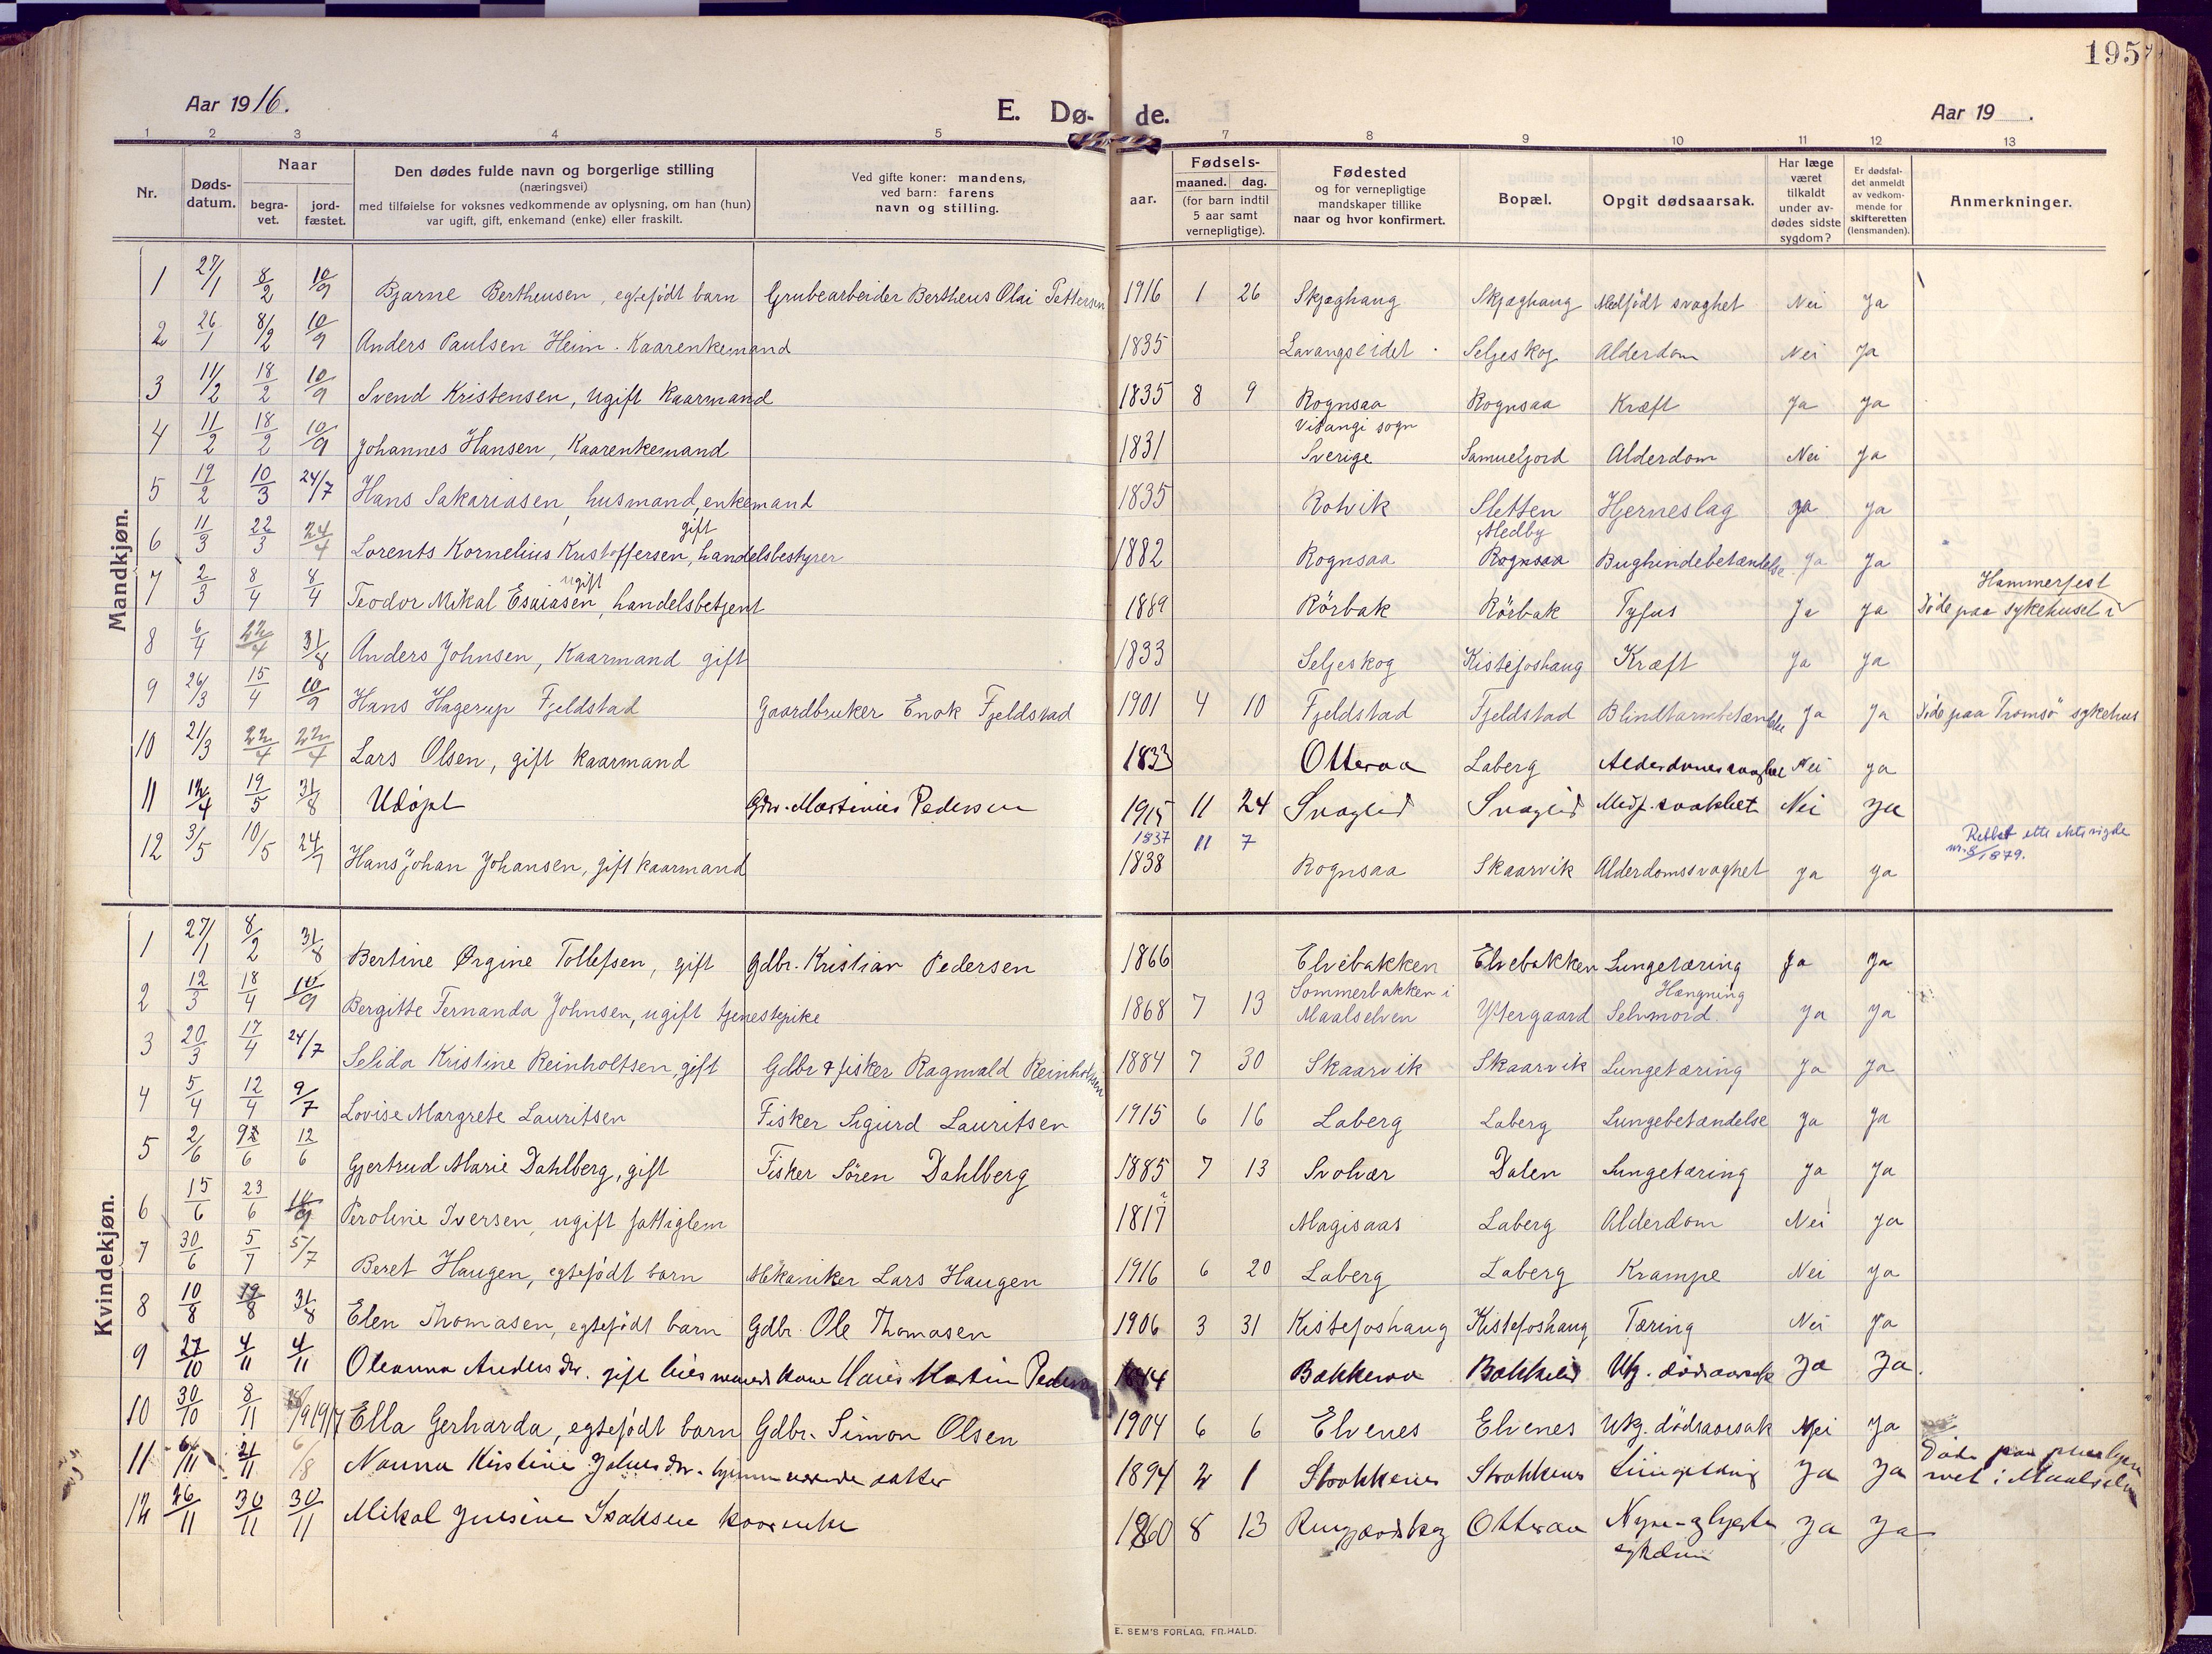 SATØ, Salangen sokneprestembete, Ministerialbok nr. 4, 1912-1927, s. 195